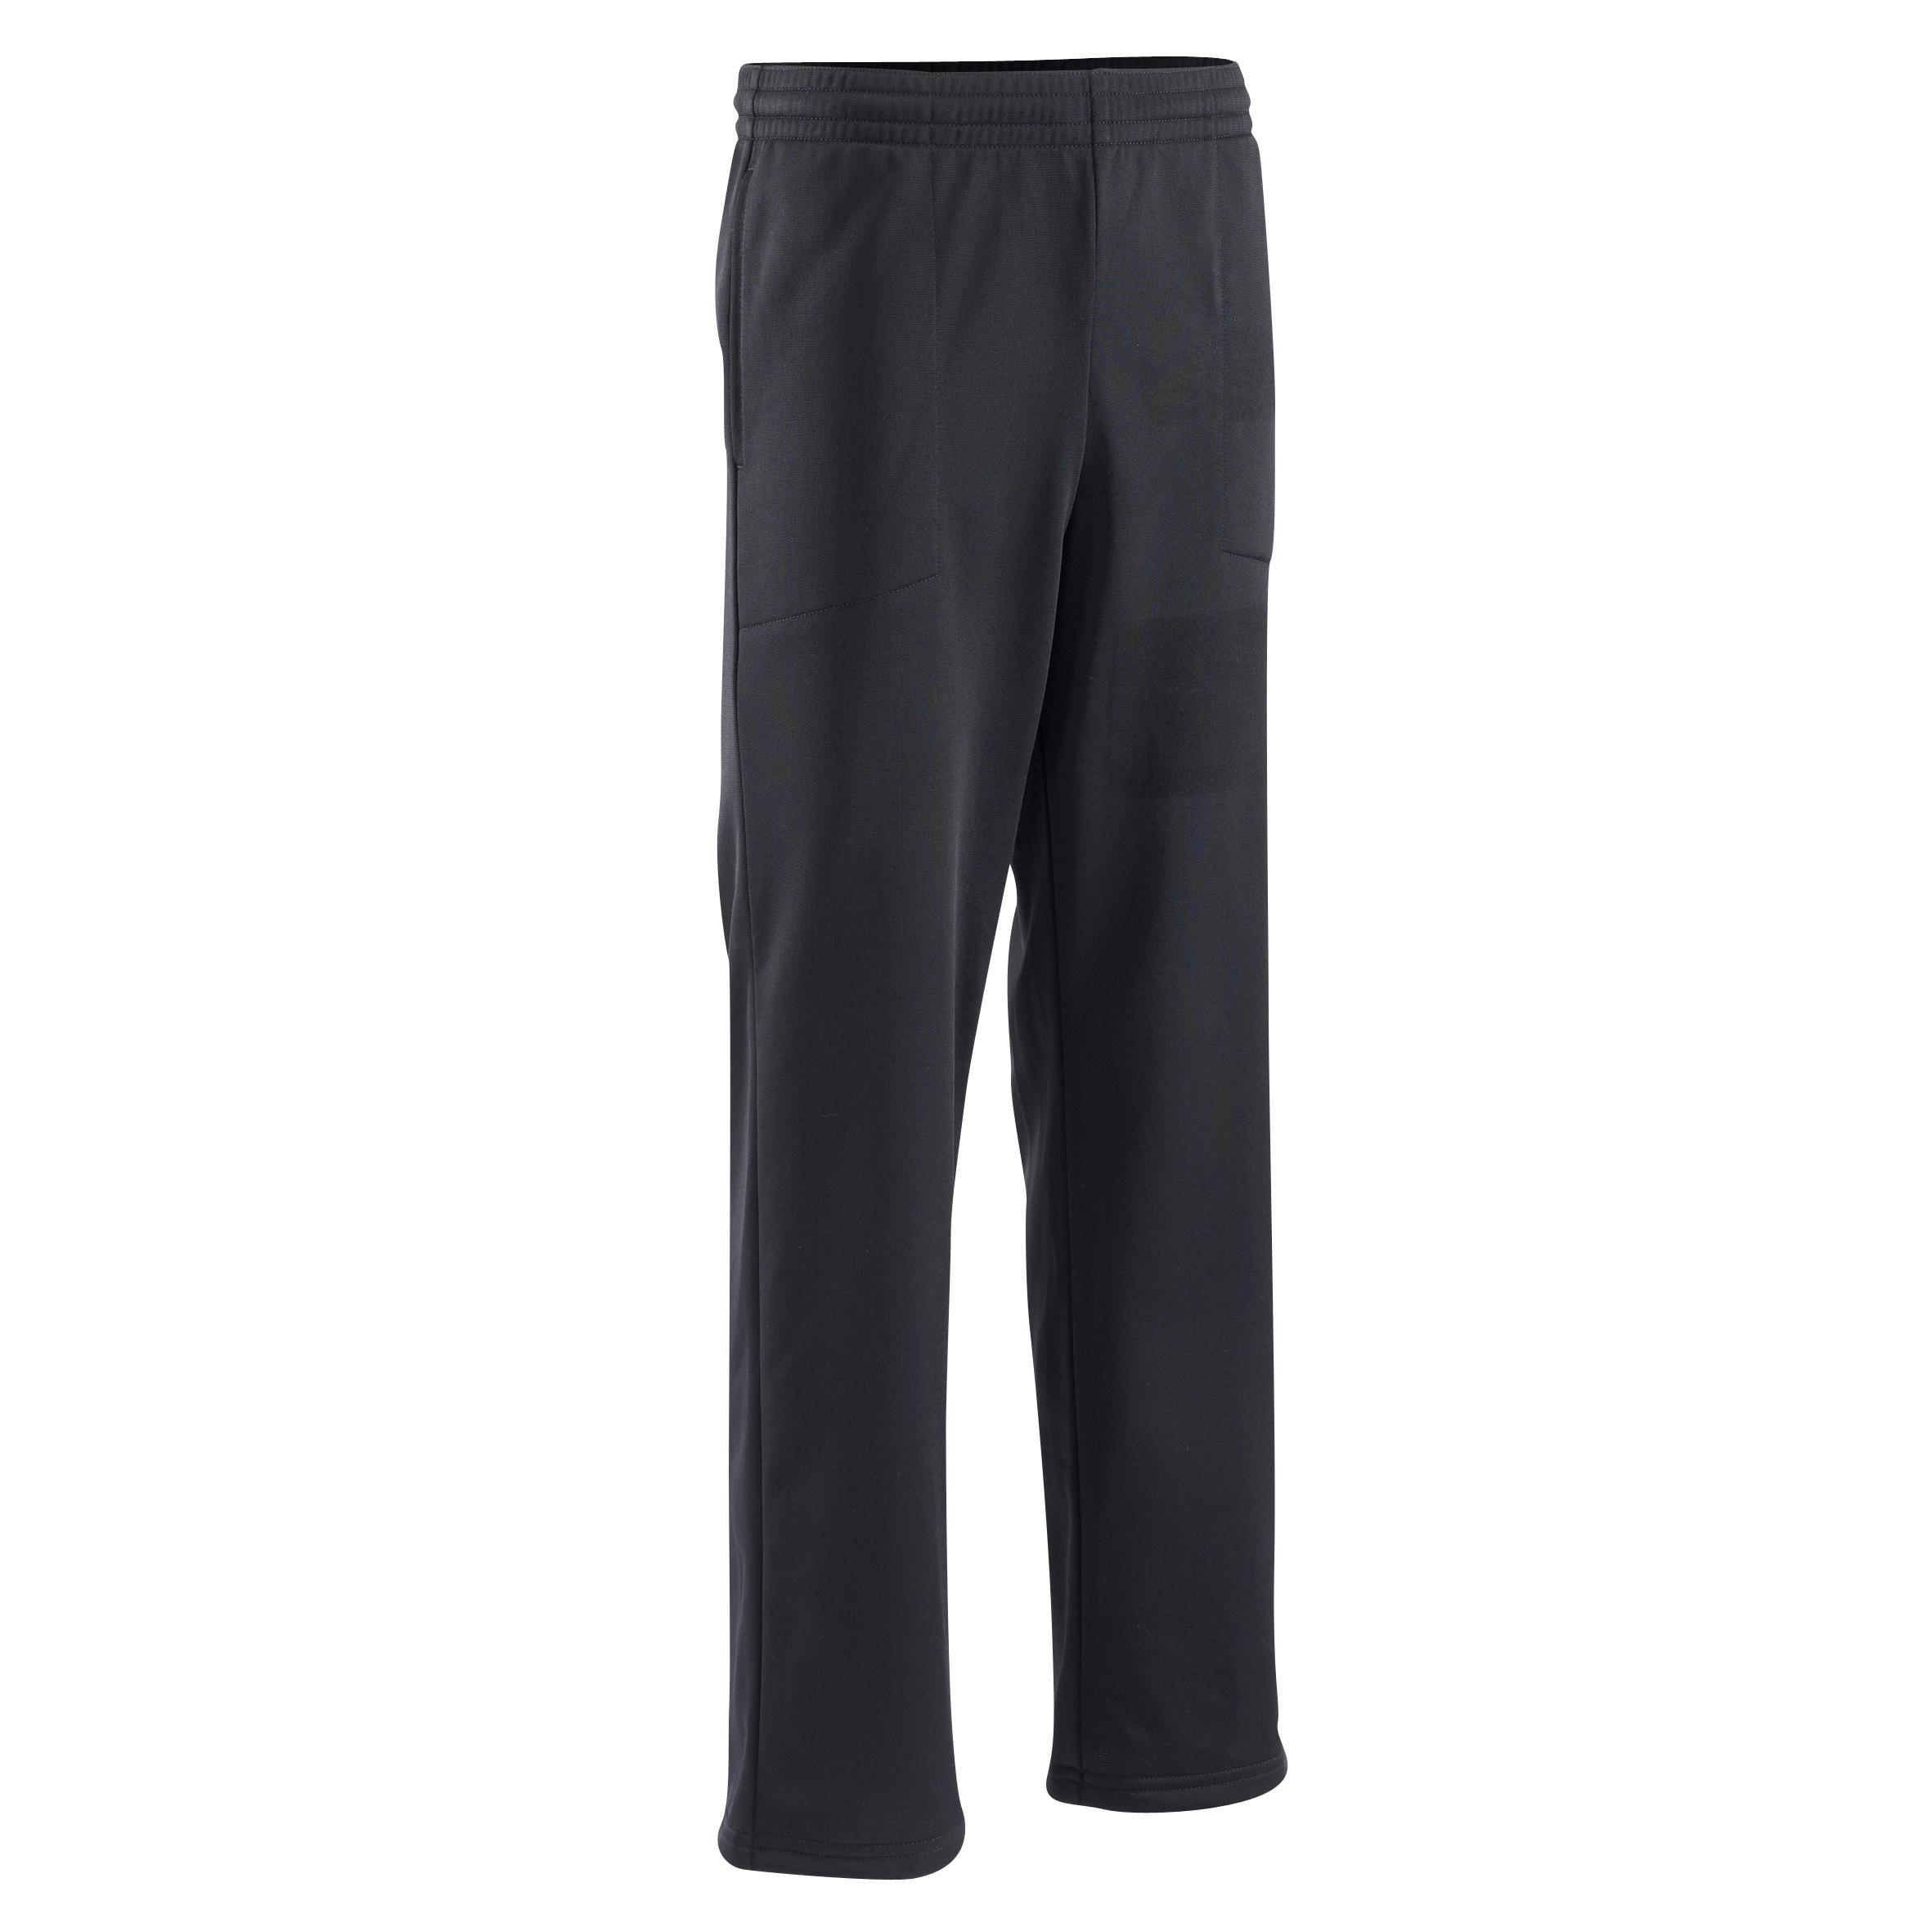 Pantalon GYM'Y Băieți